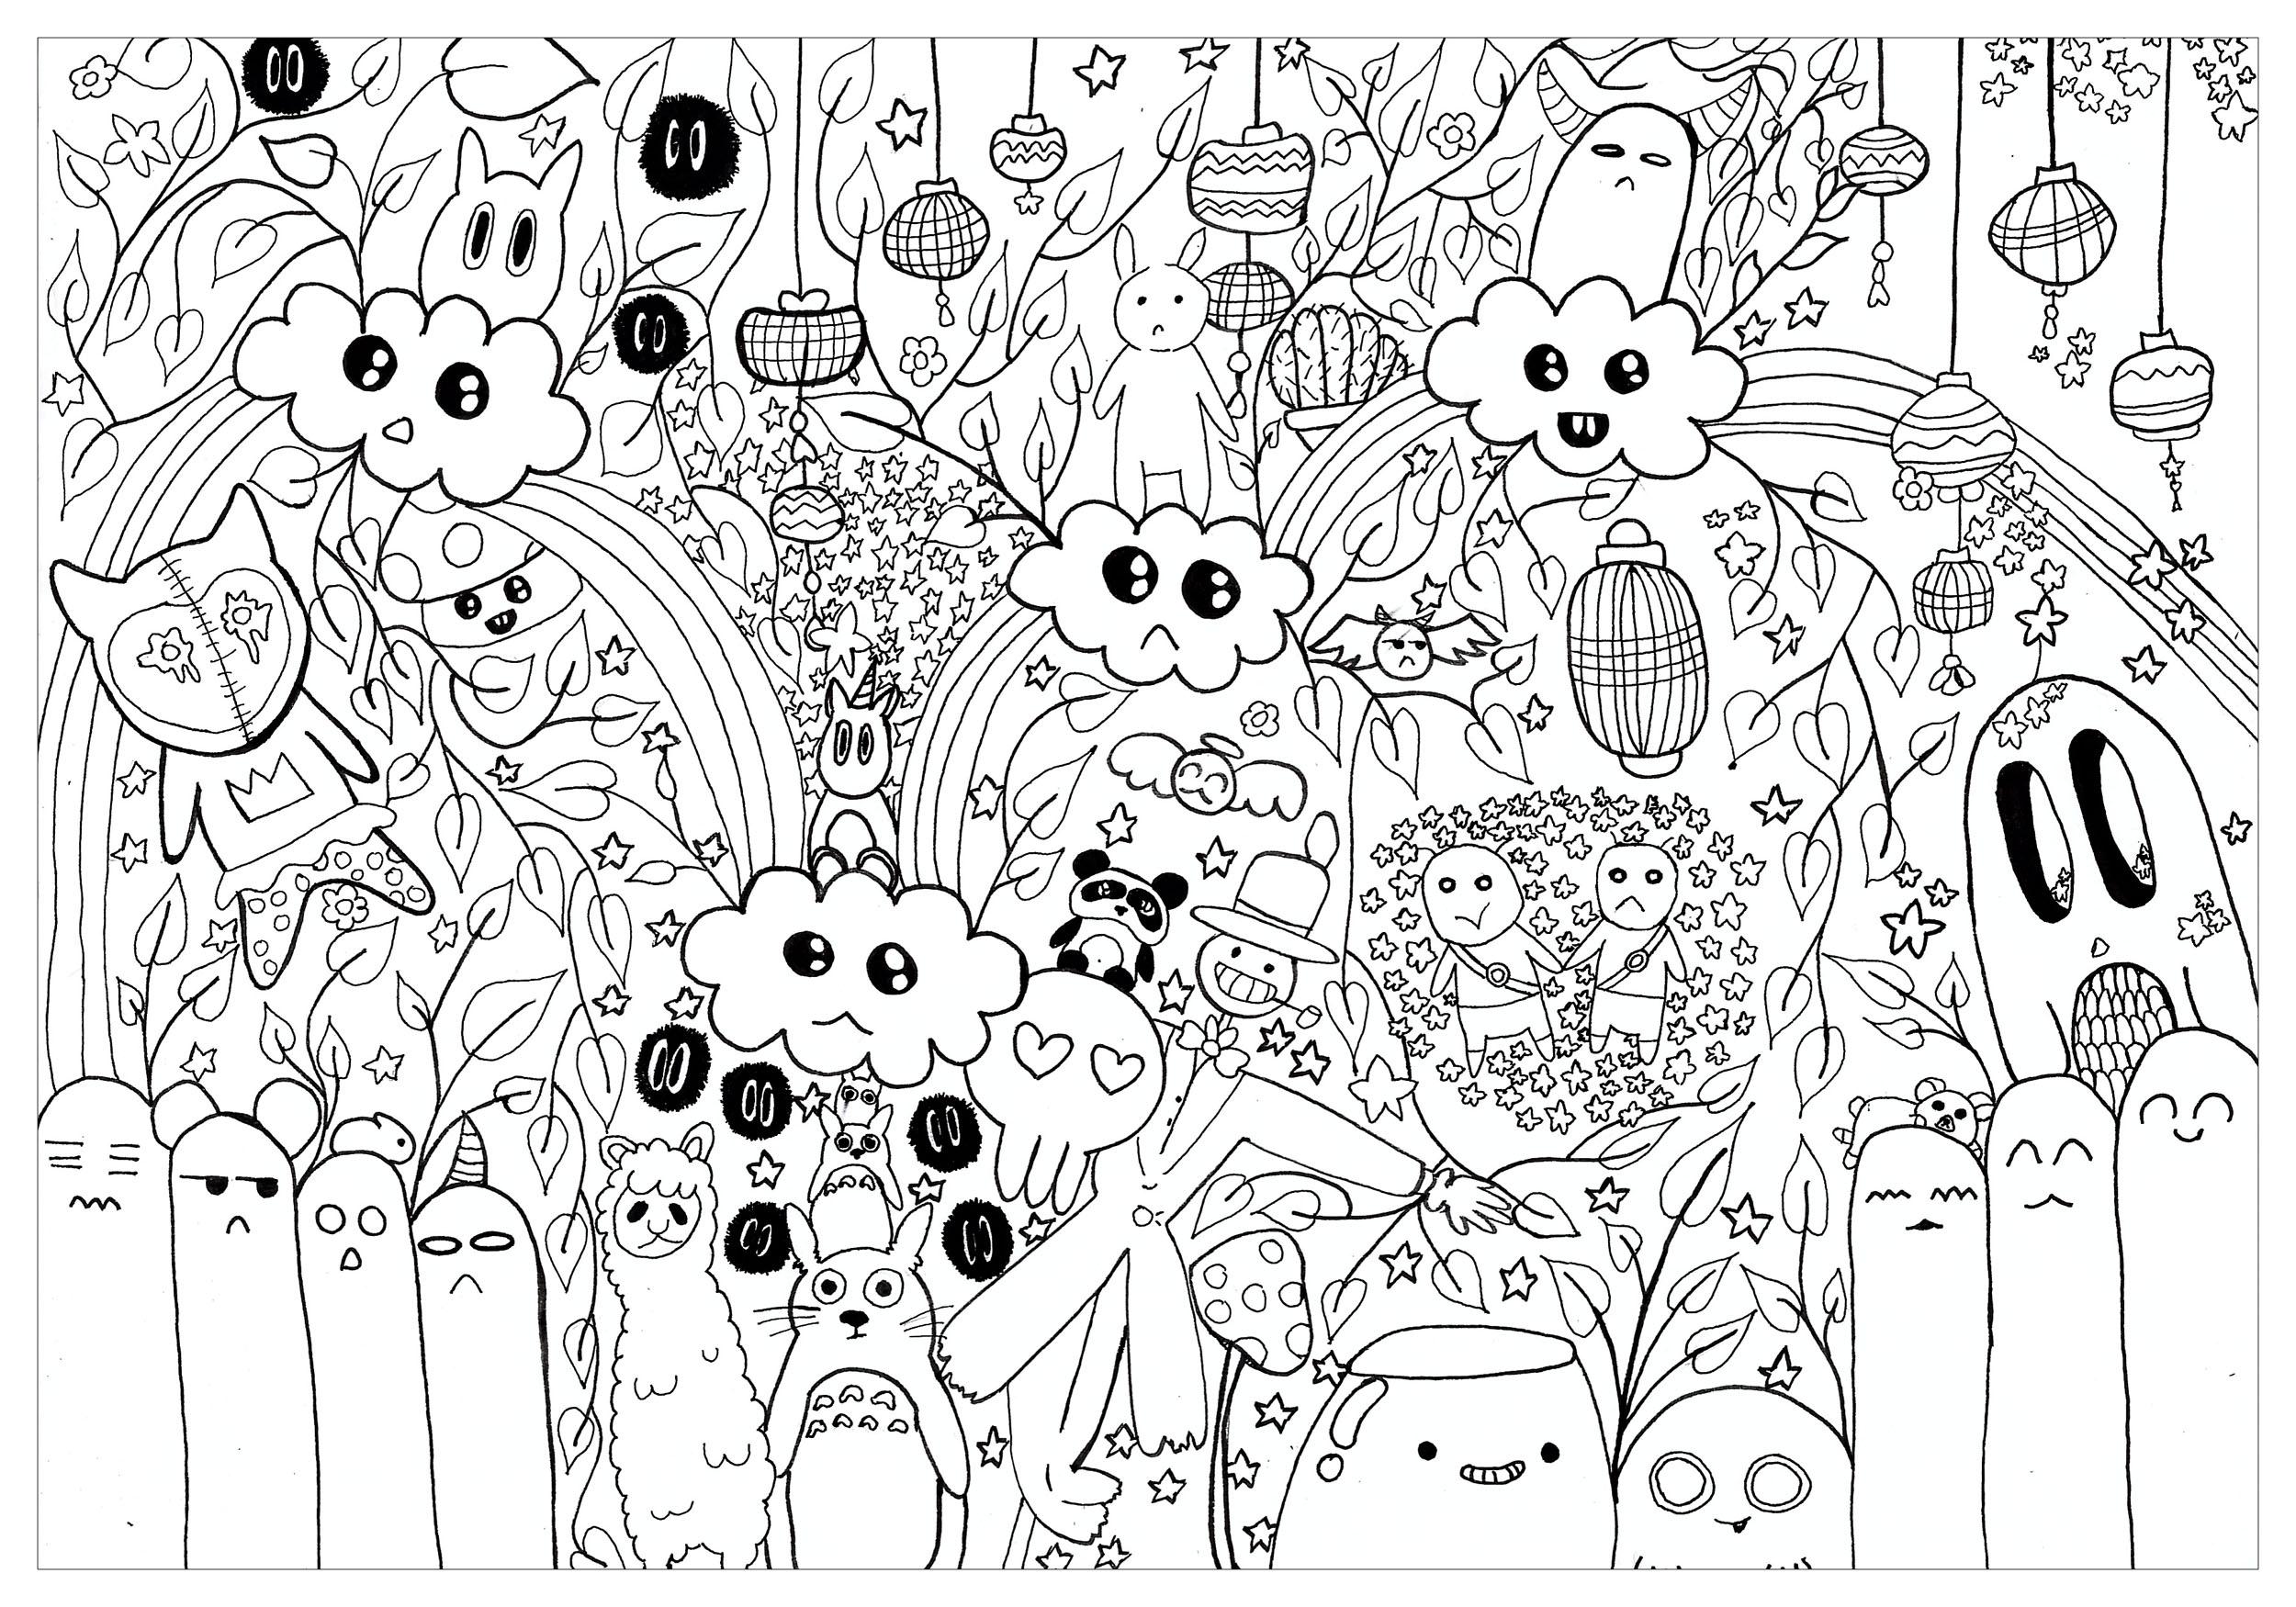 Doodle : Totoro